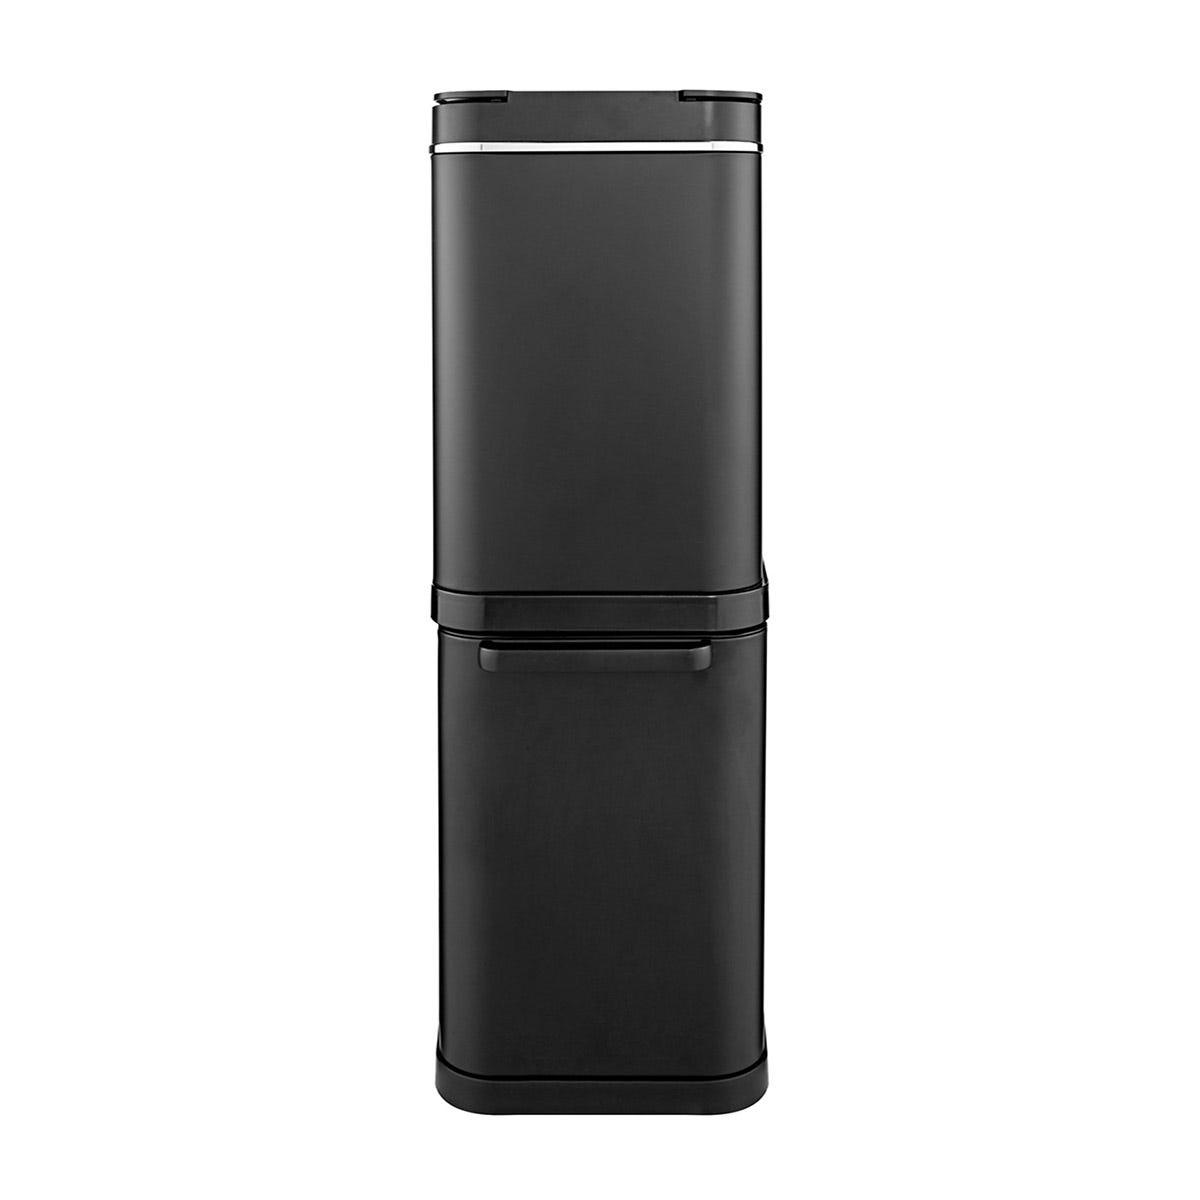 Tower 50L Dual Recycling Bin - Black